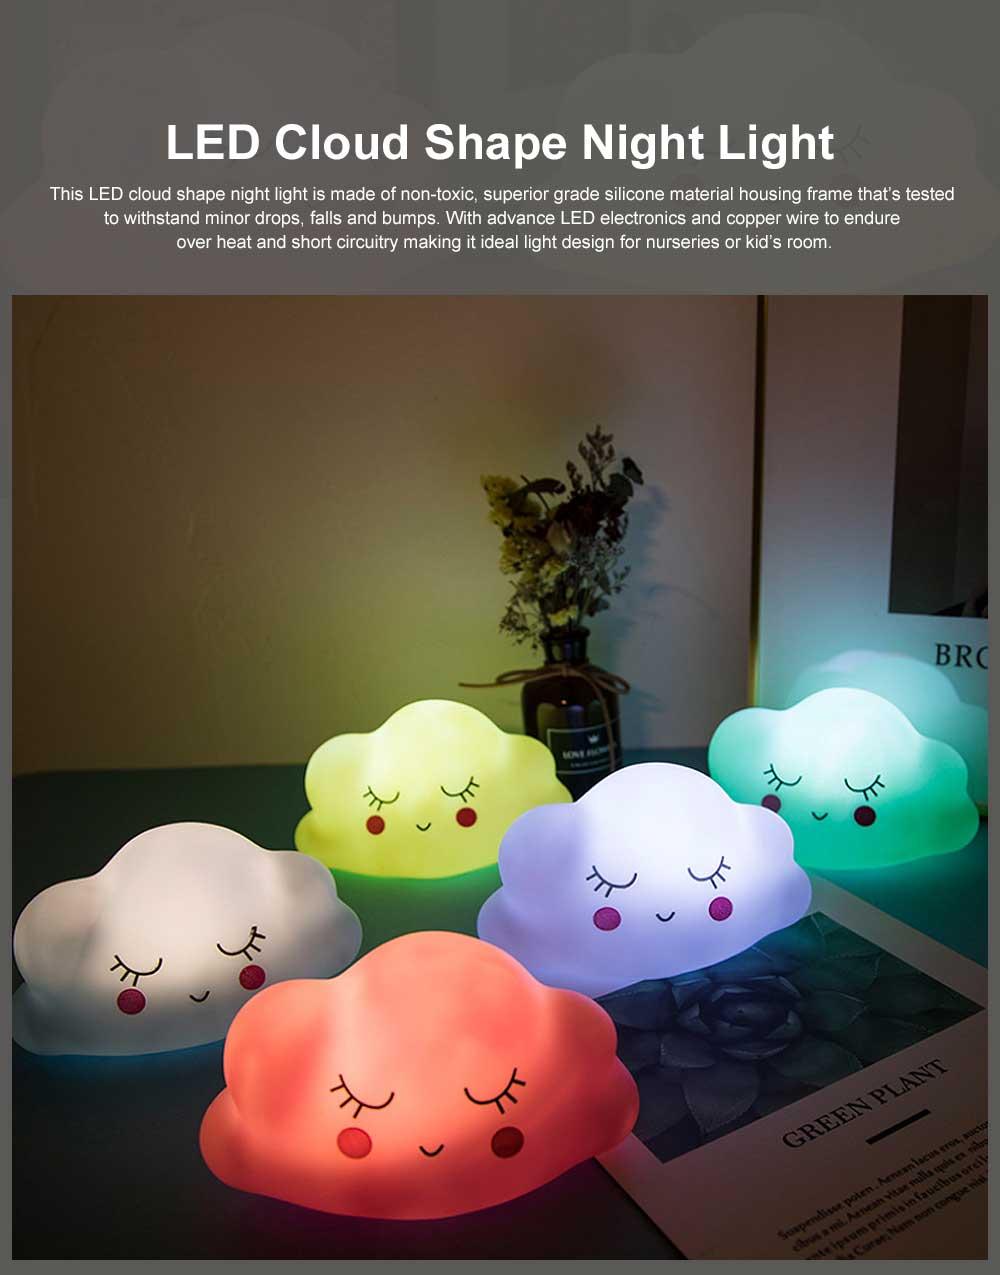 LED Cloud Shape Smile Night Light, Warm Lighting Colorful Bed Side Lights, Home Decor for Kids Baby Nursery Living Room Dorm 0